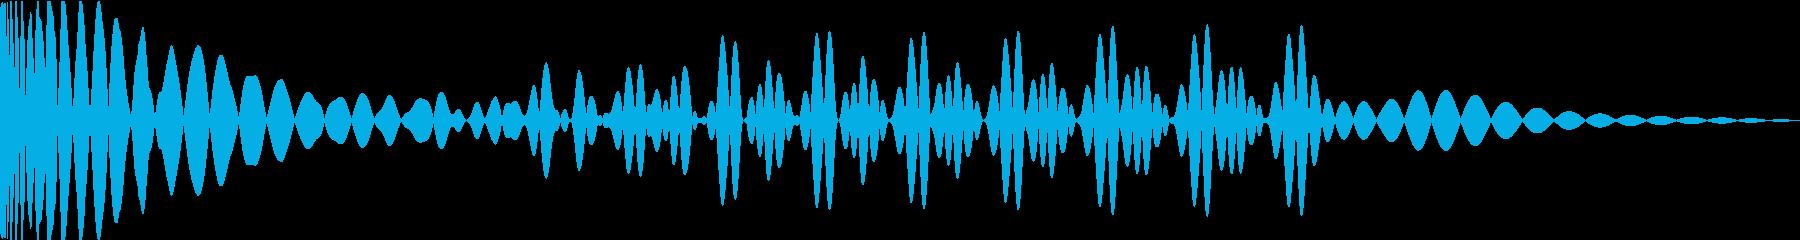 EDMキック キーBの再生済みの波形